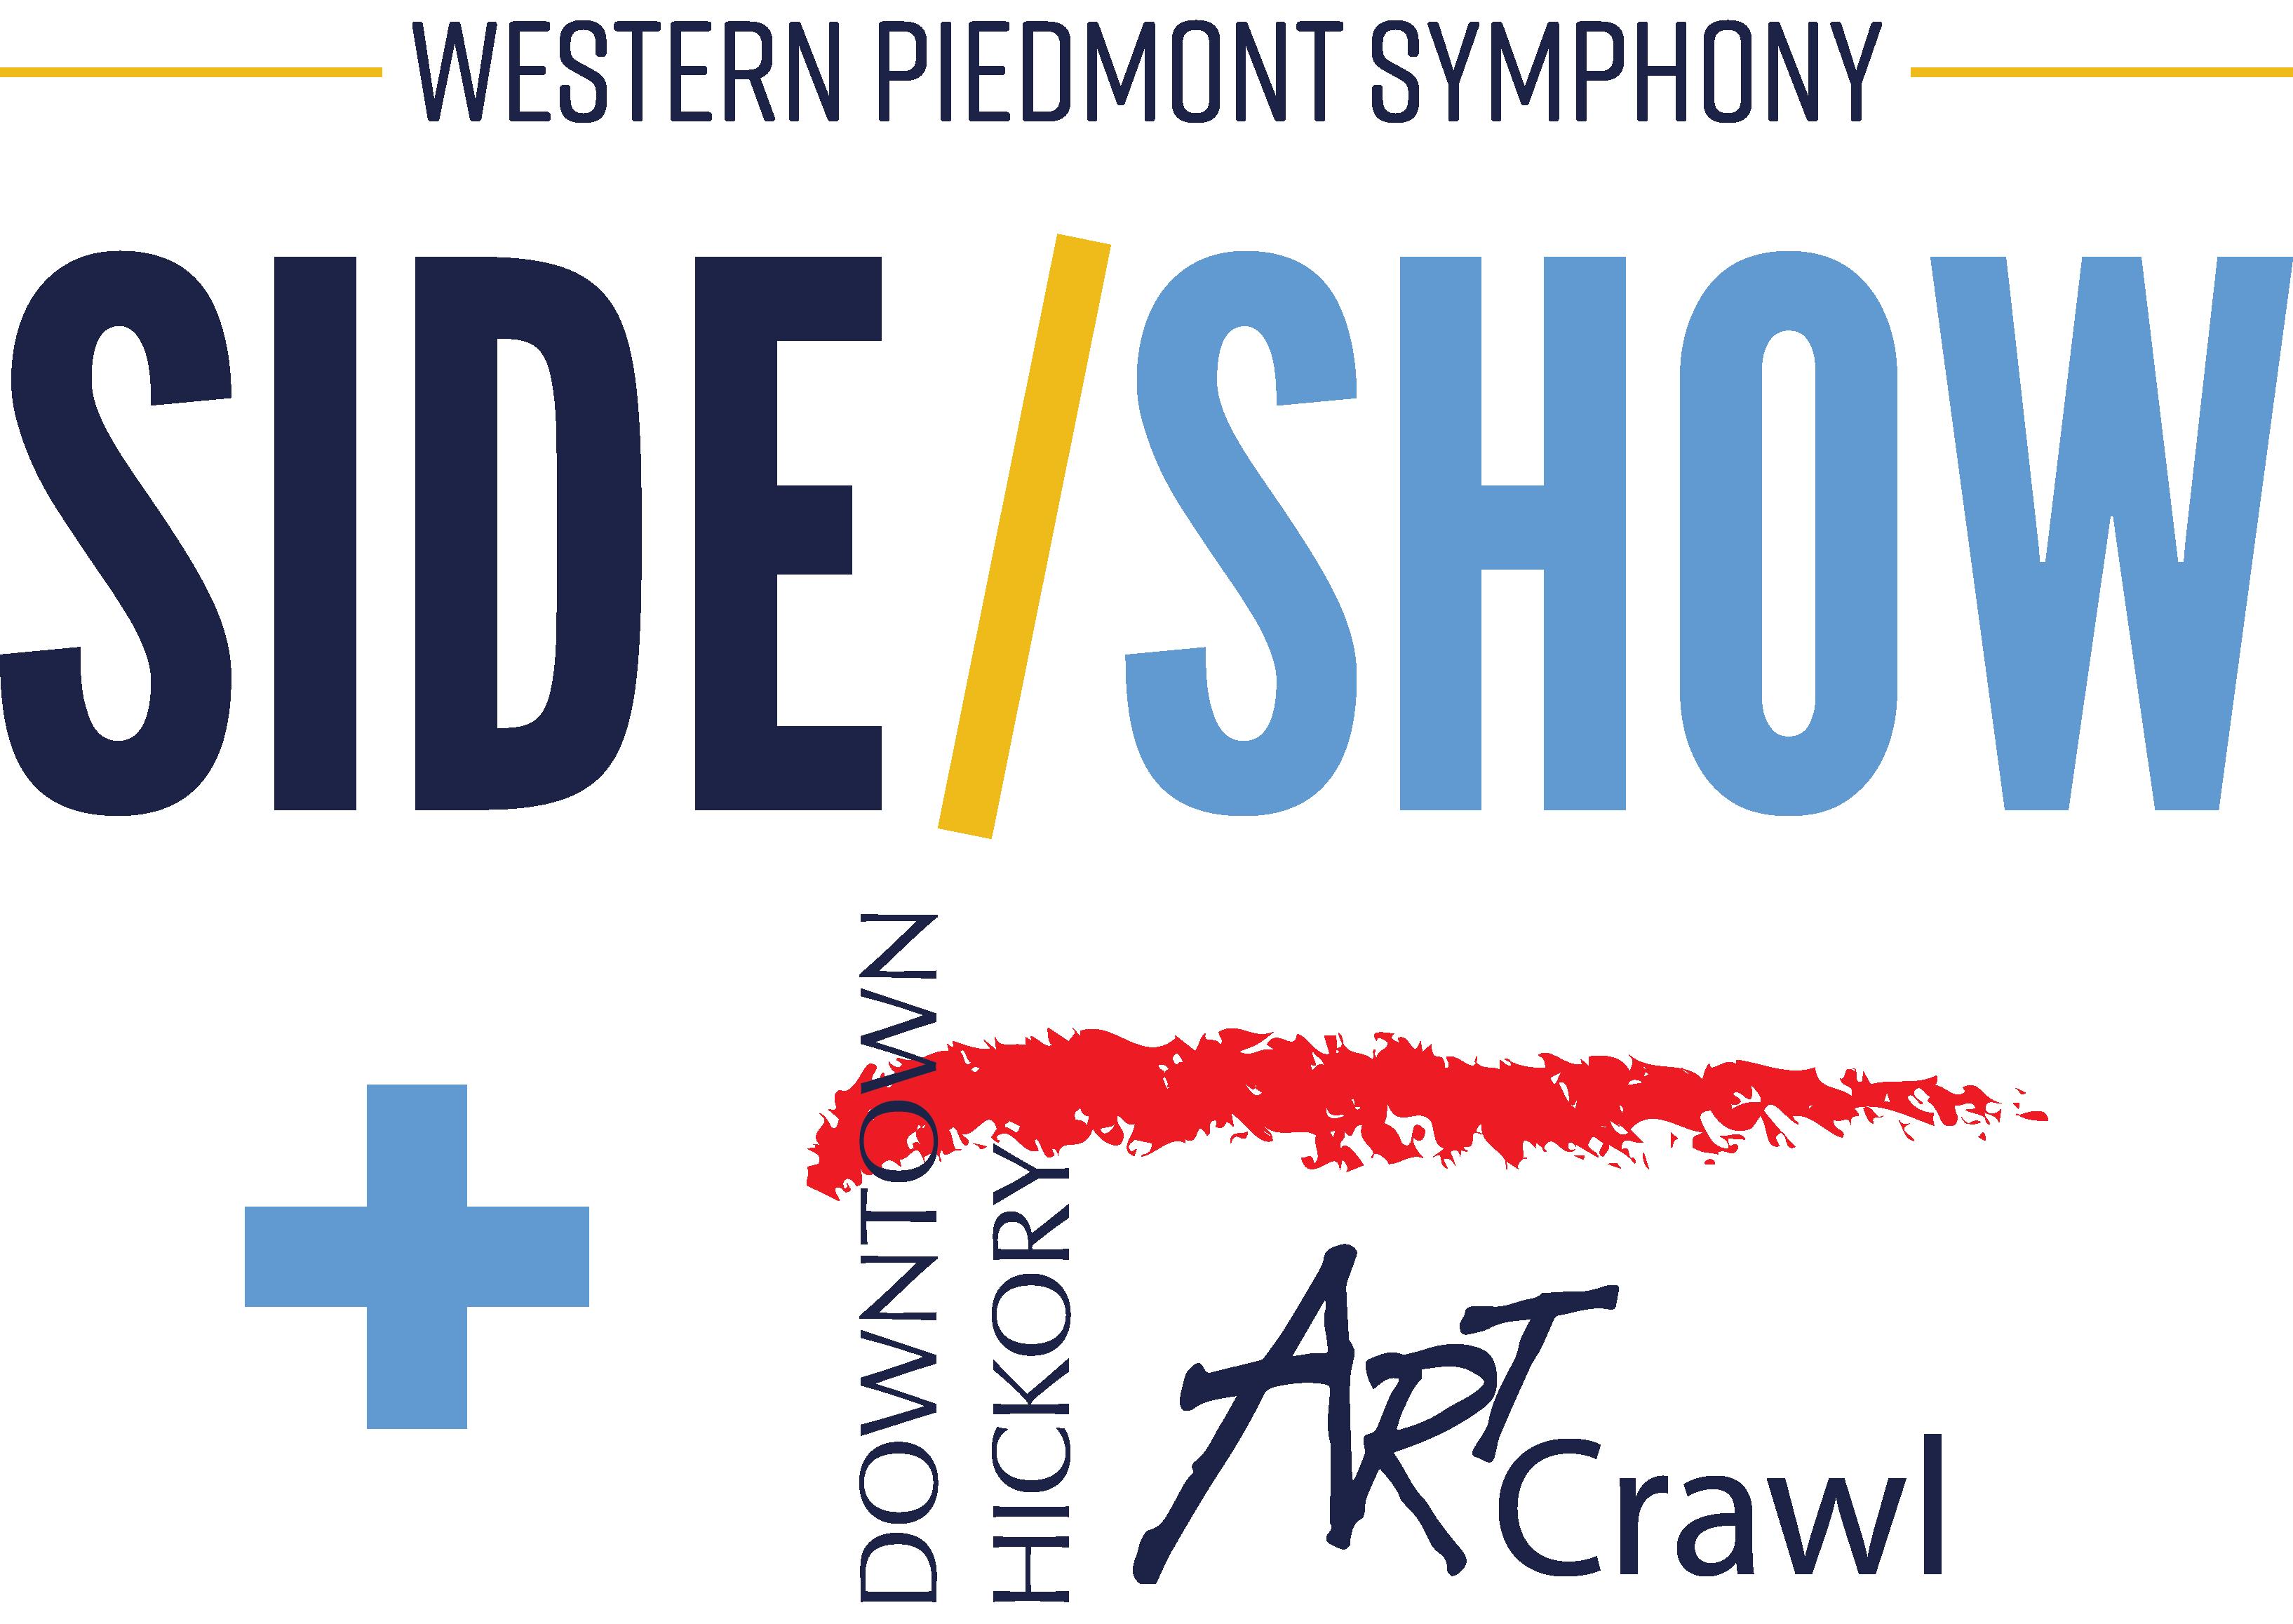 SideShow Fall 21 logo